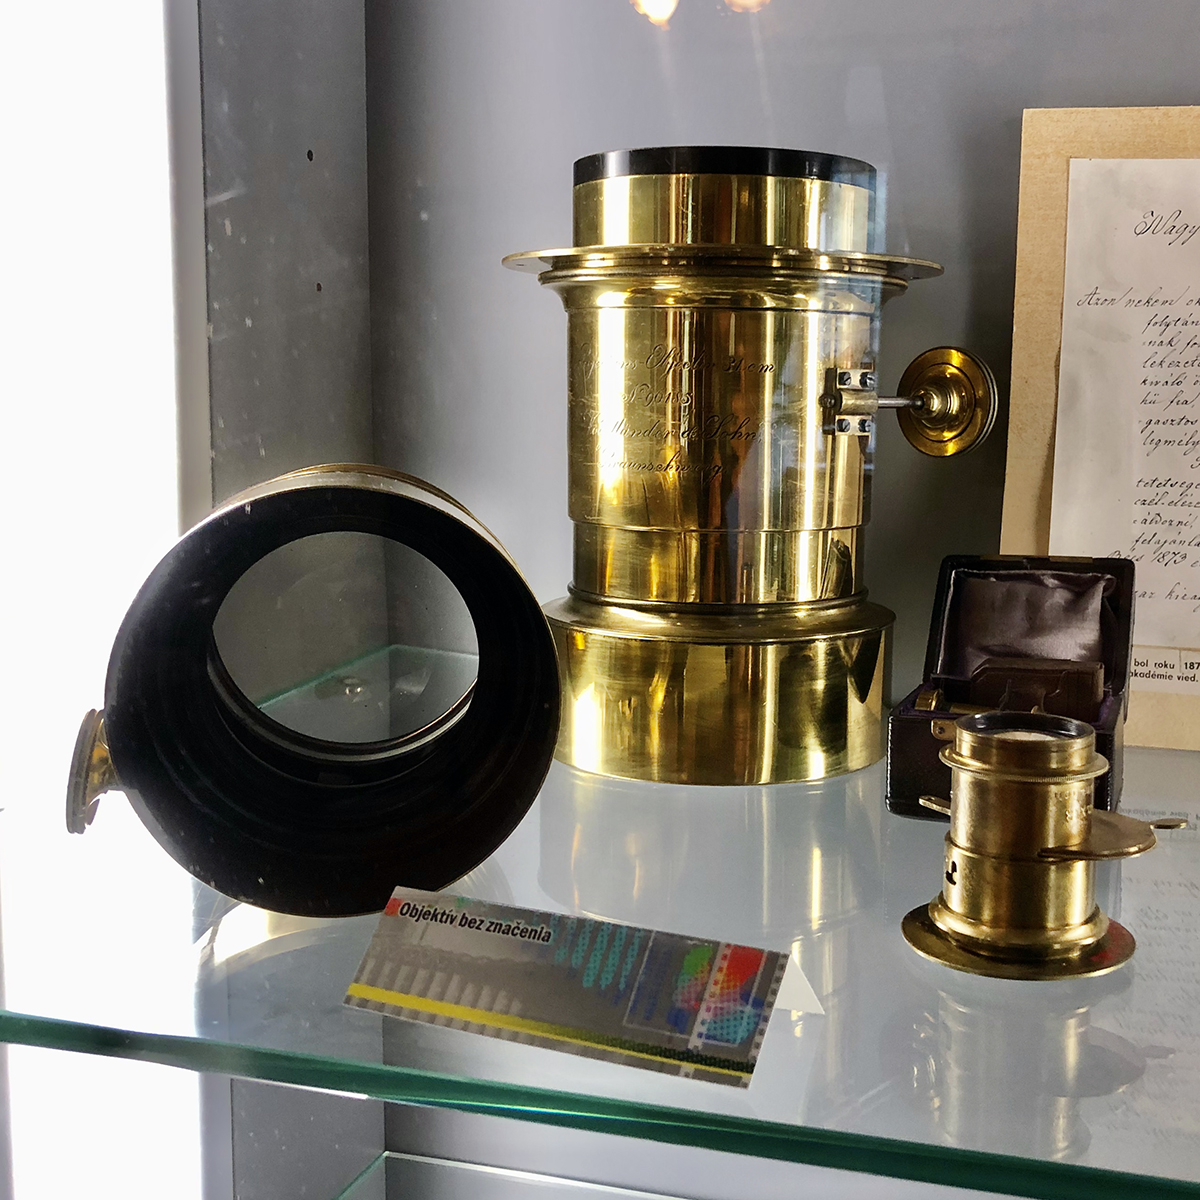 Petzval Lens 1